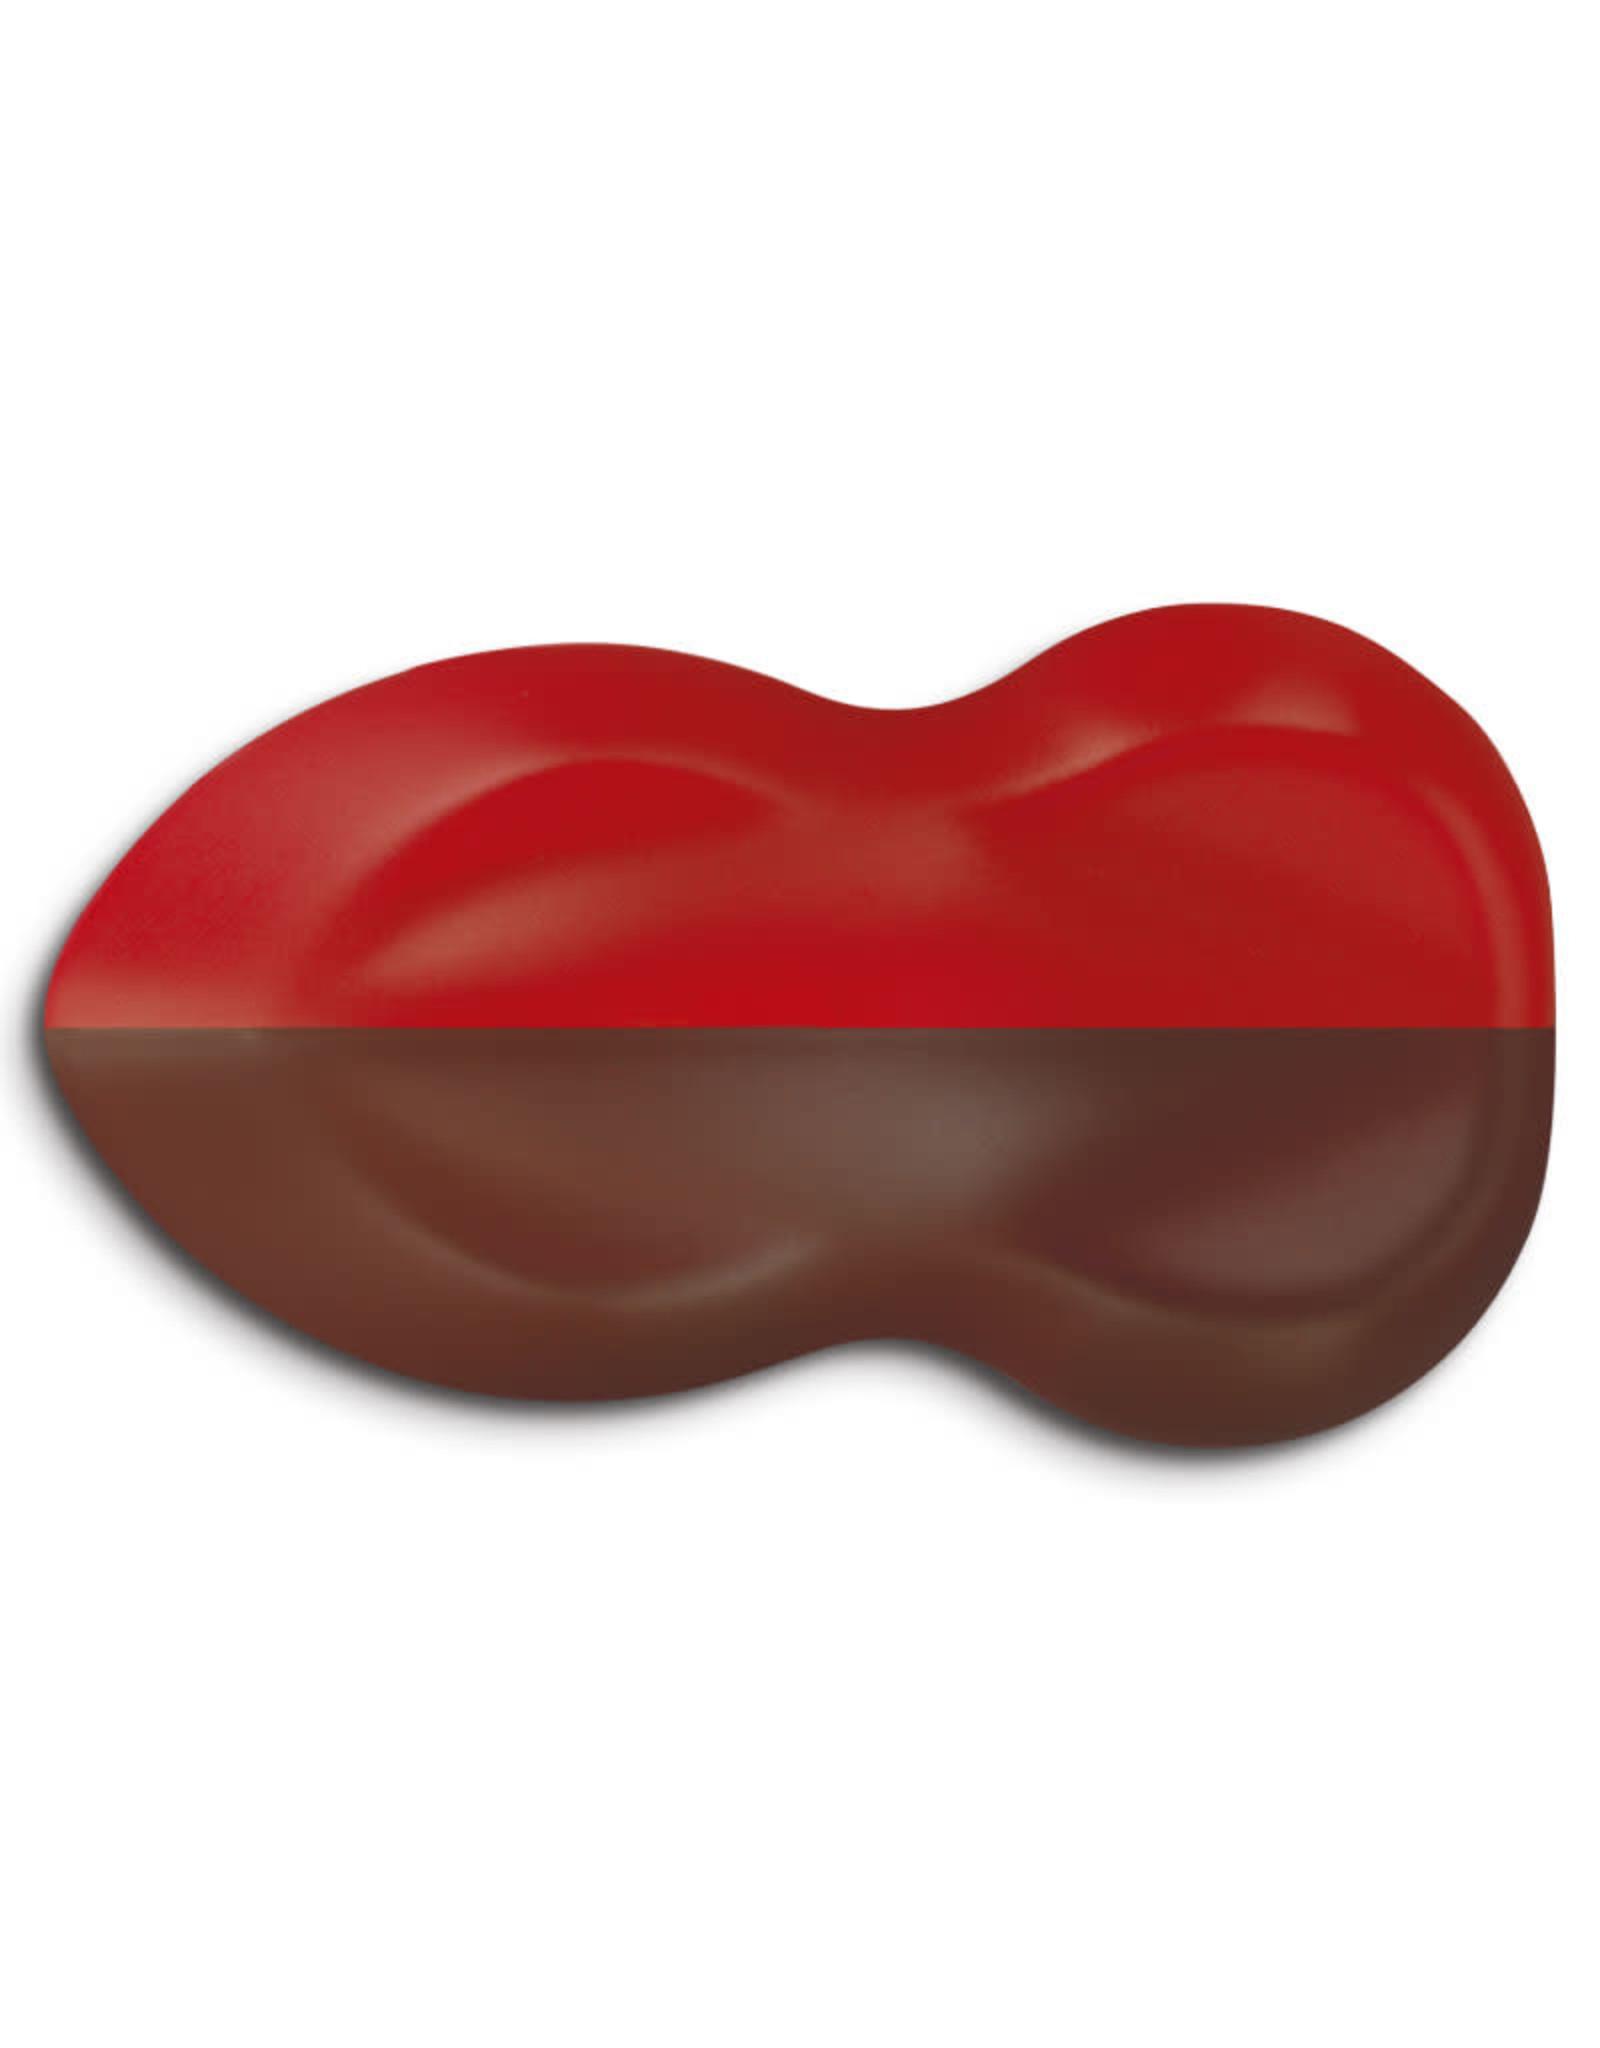 Schmincke Schmincke AERO Color Standard Colours 28 ml - 28306 Brilliant Red